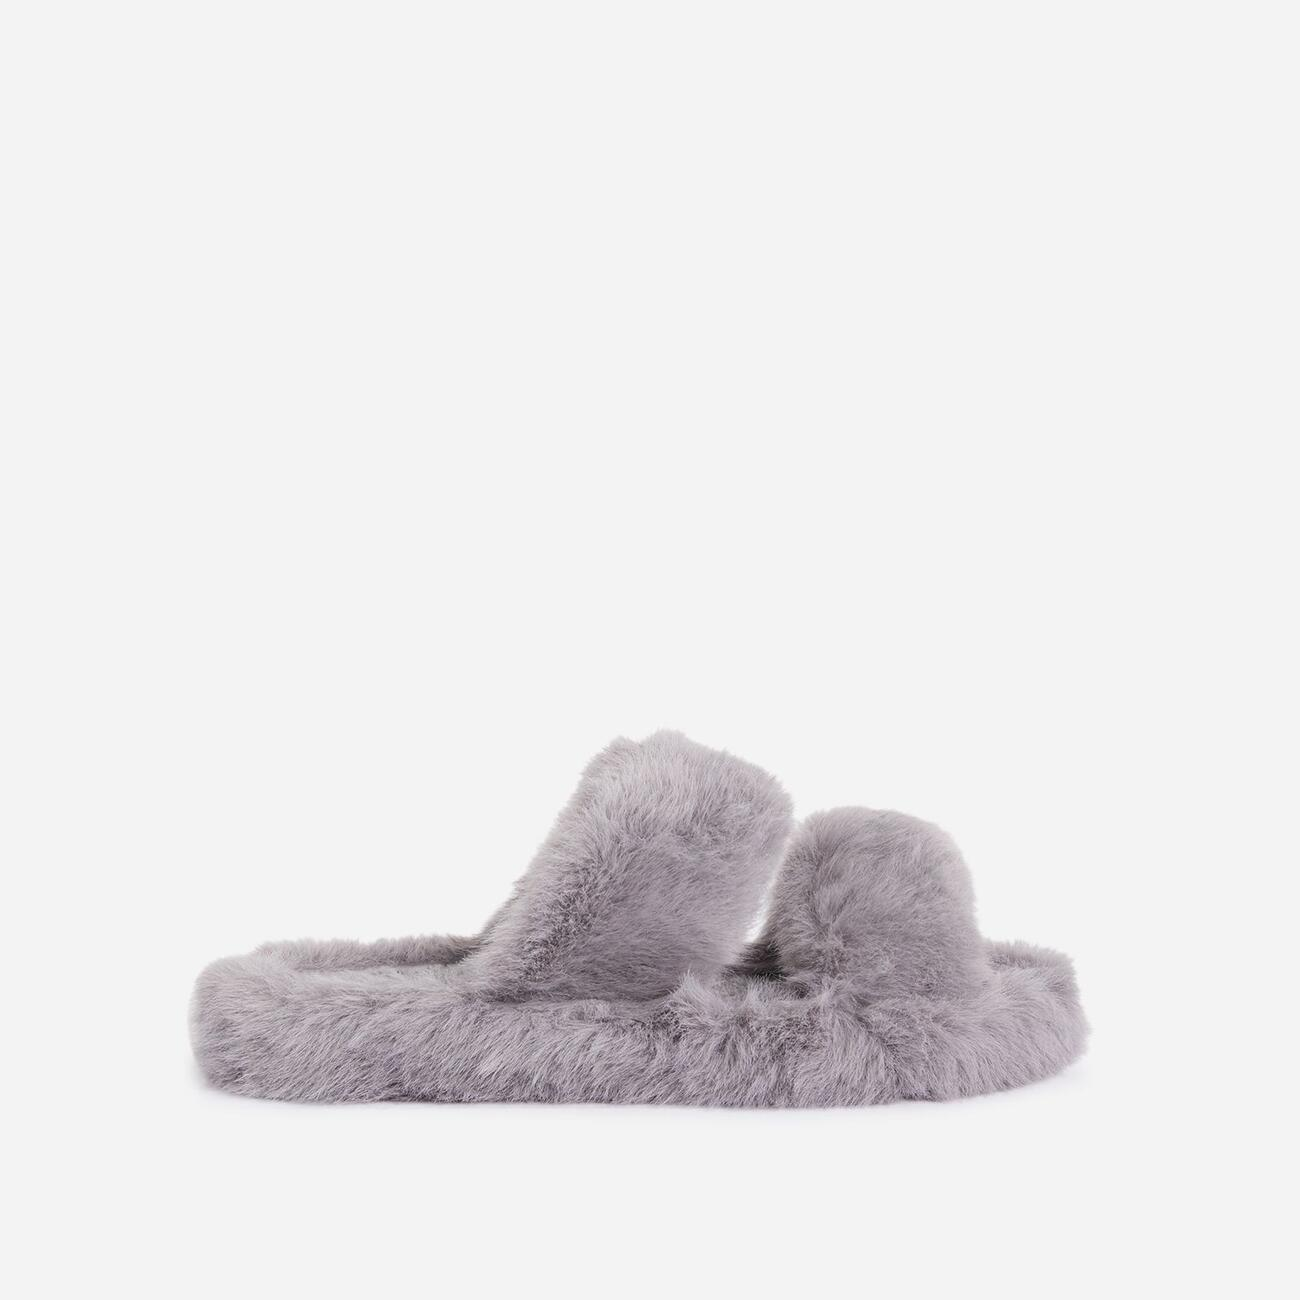 Pamper Fluffy Double Strap Slider Slipper In Grey Faux Fur Image 1